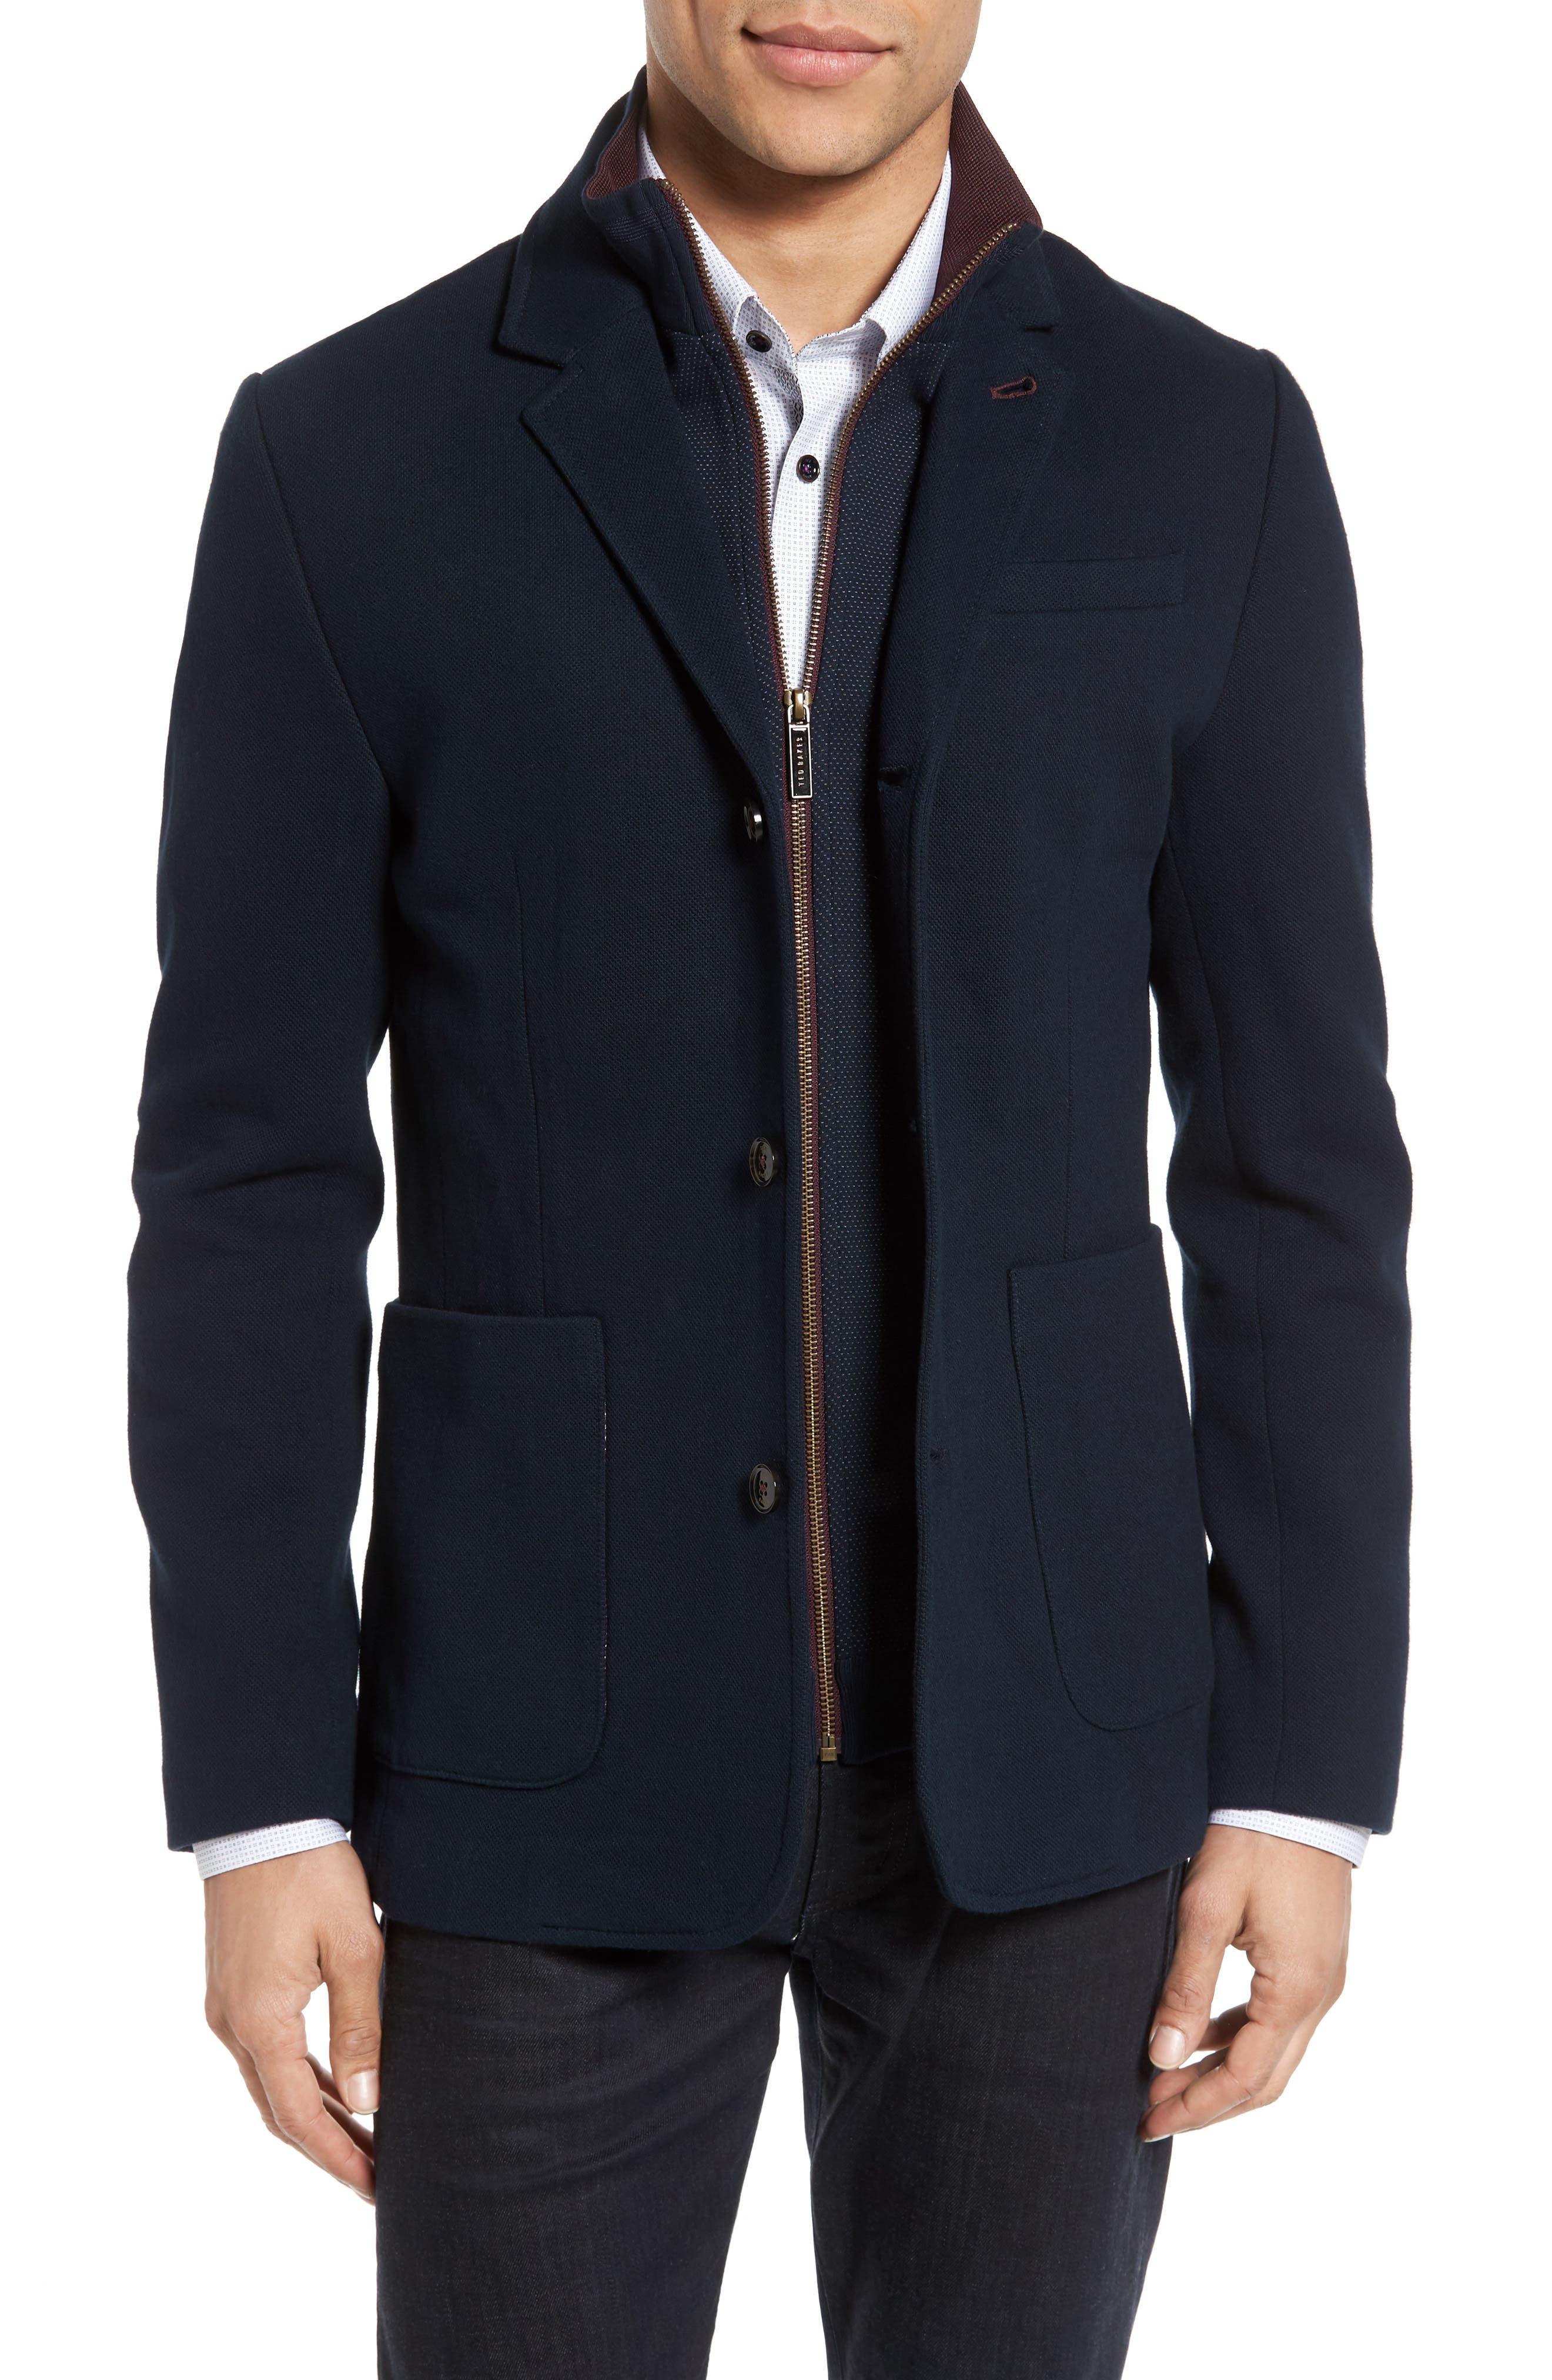 Main Image - Ted Baker London Knit Bib Inset Three-Button Jacket